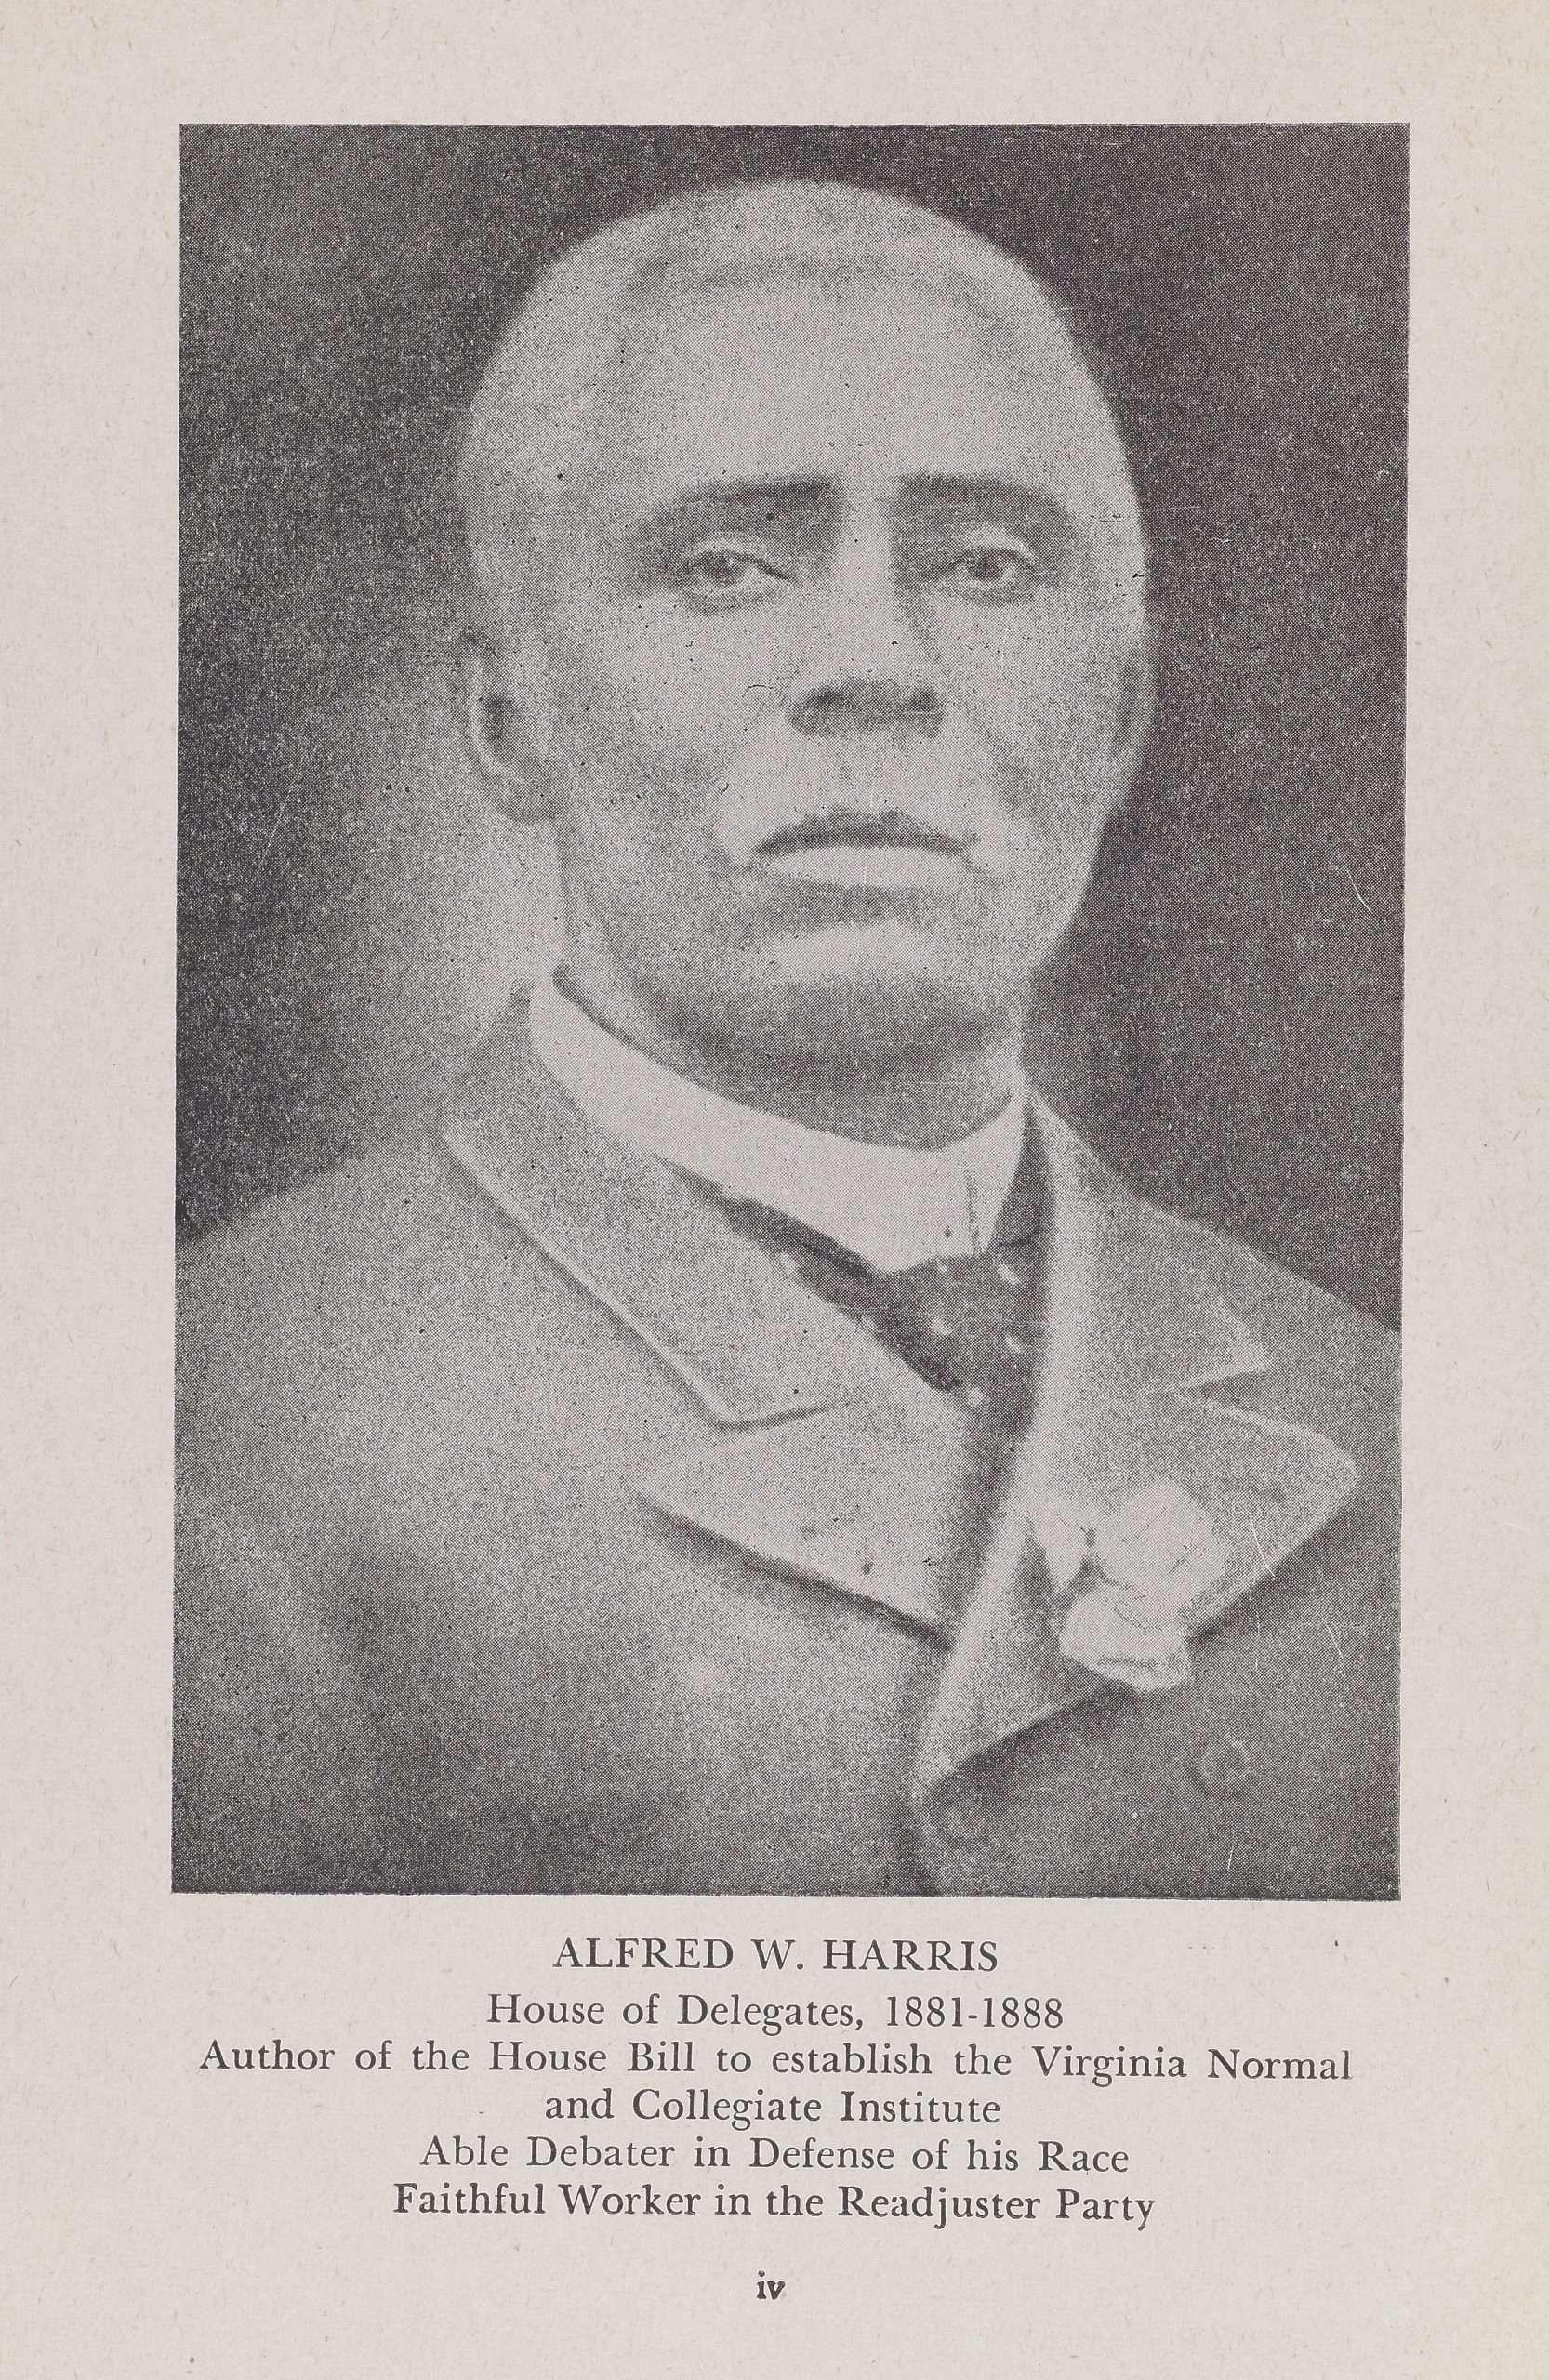 Alfred W. Harris